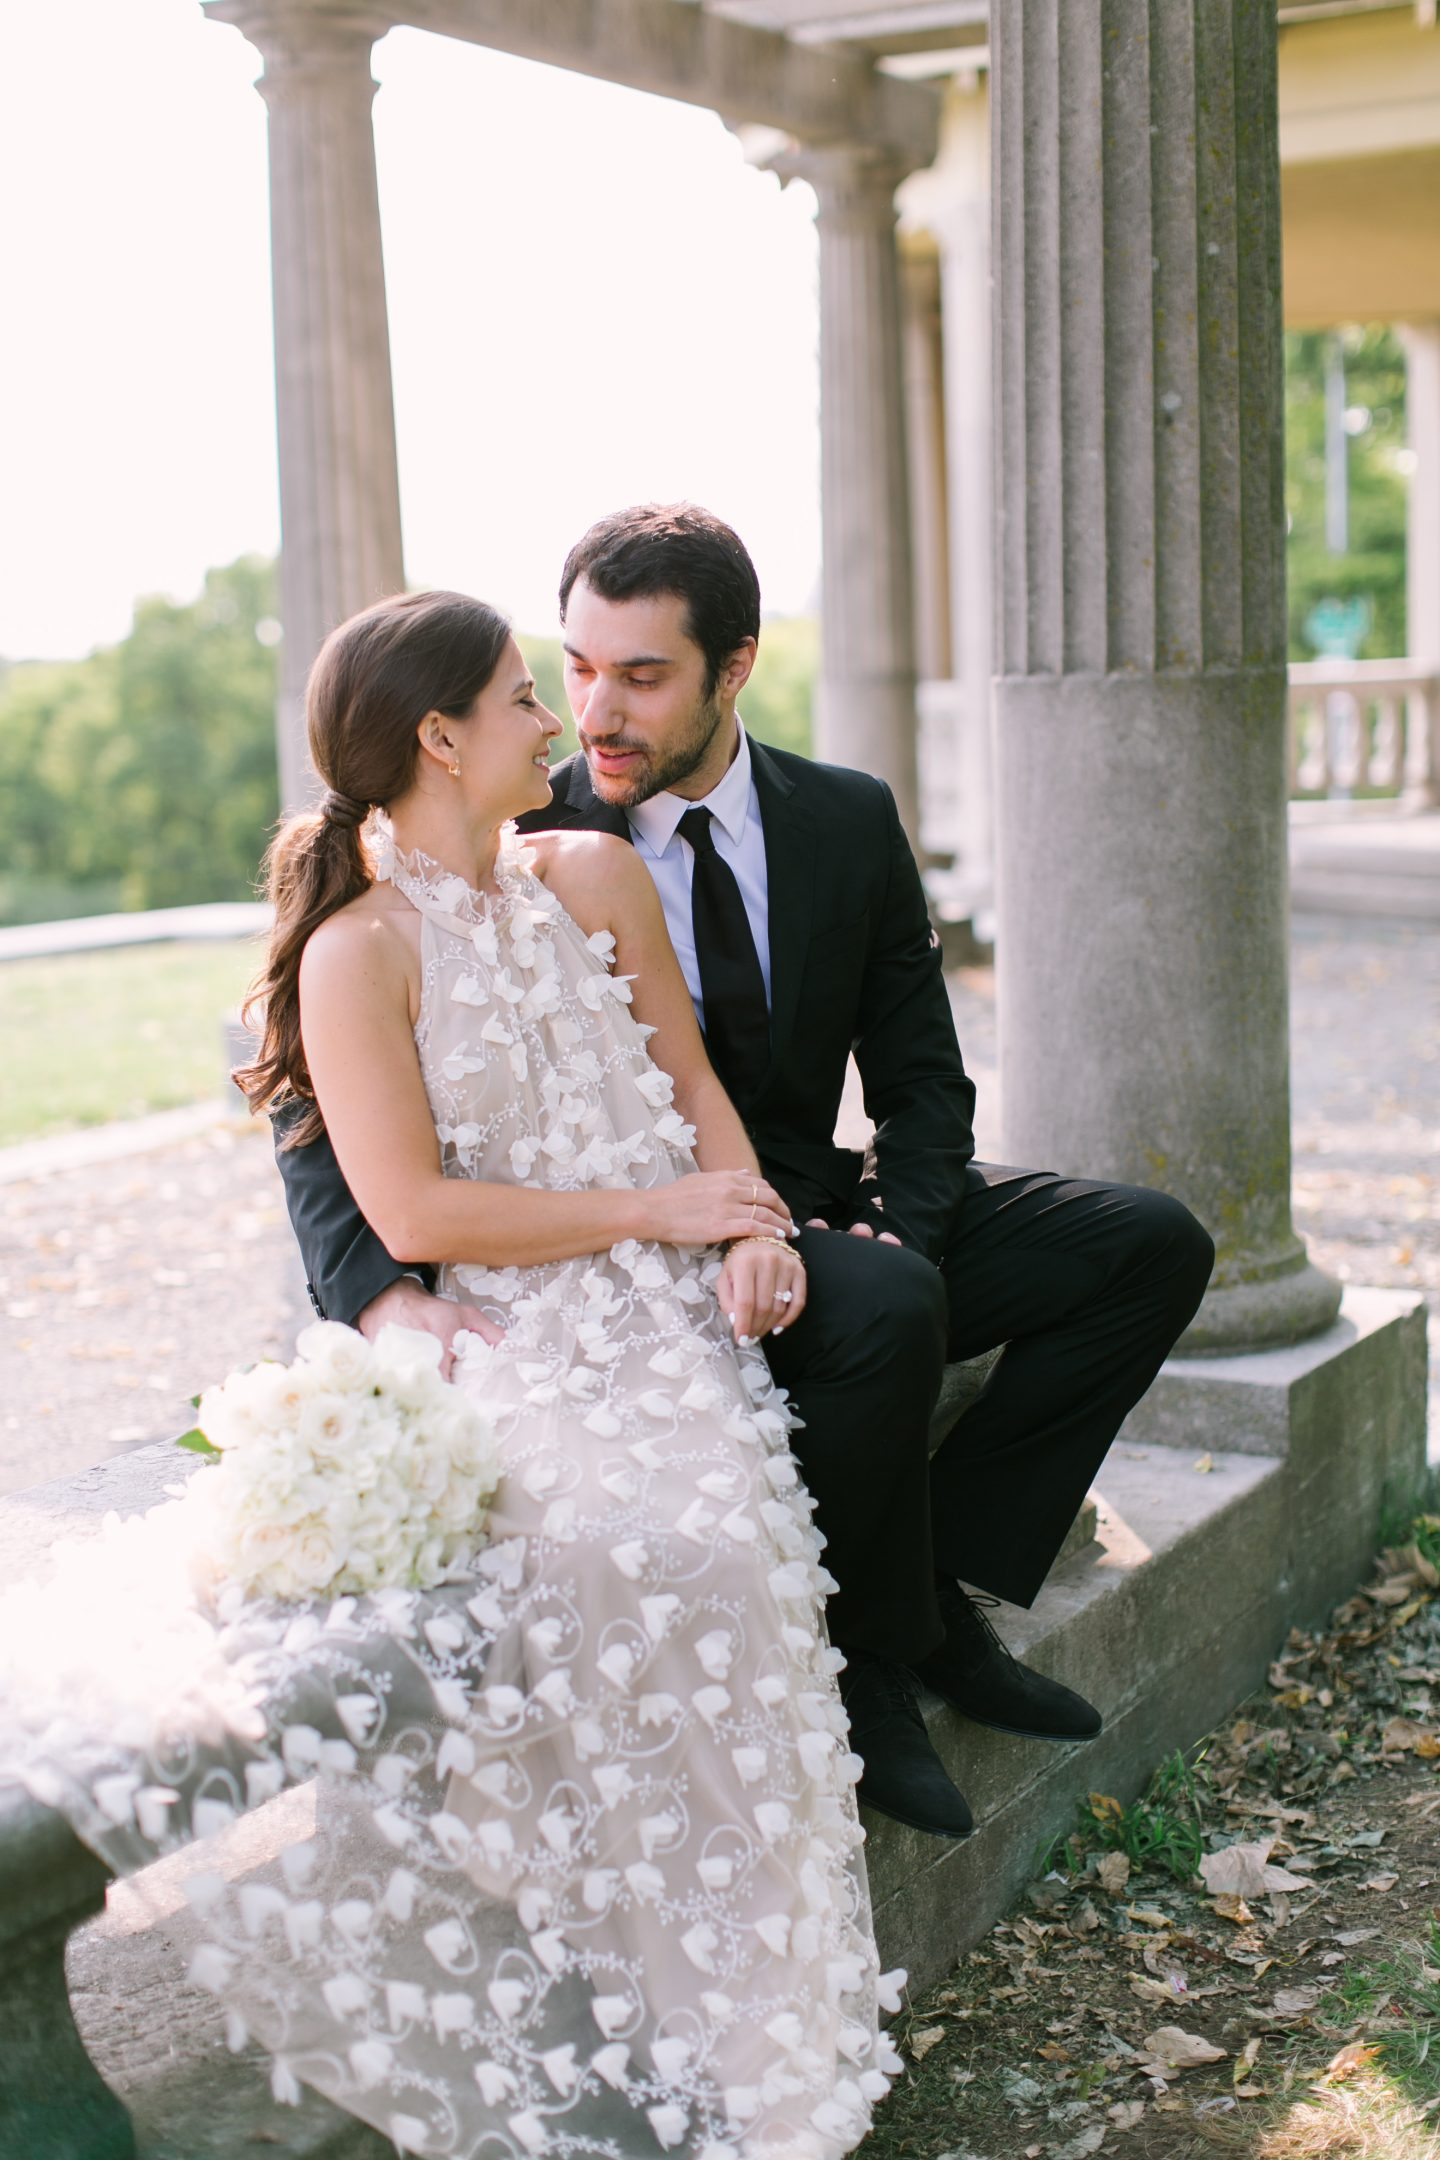 The Concourse Kessler Park Wedding location